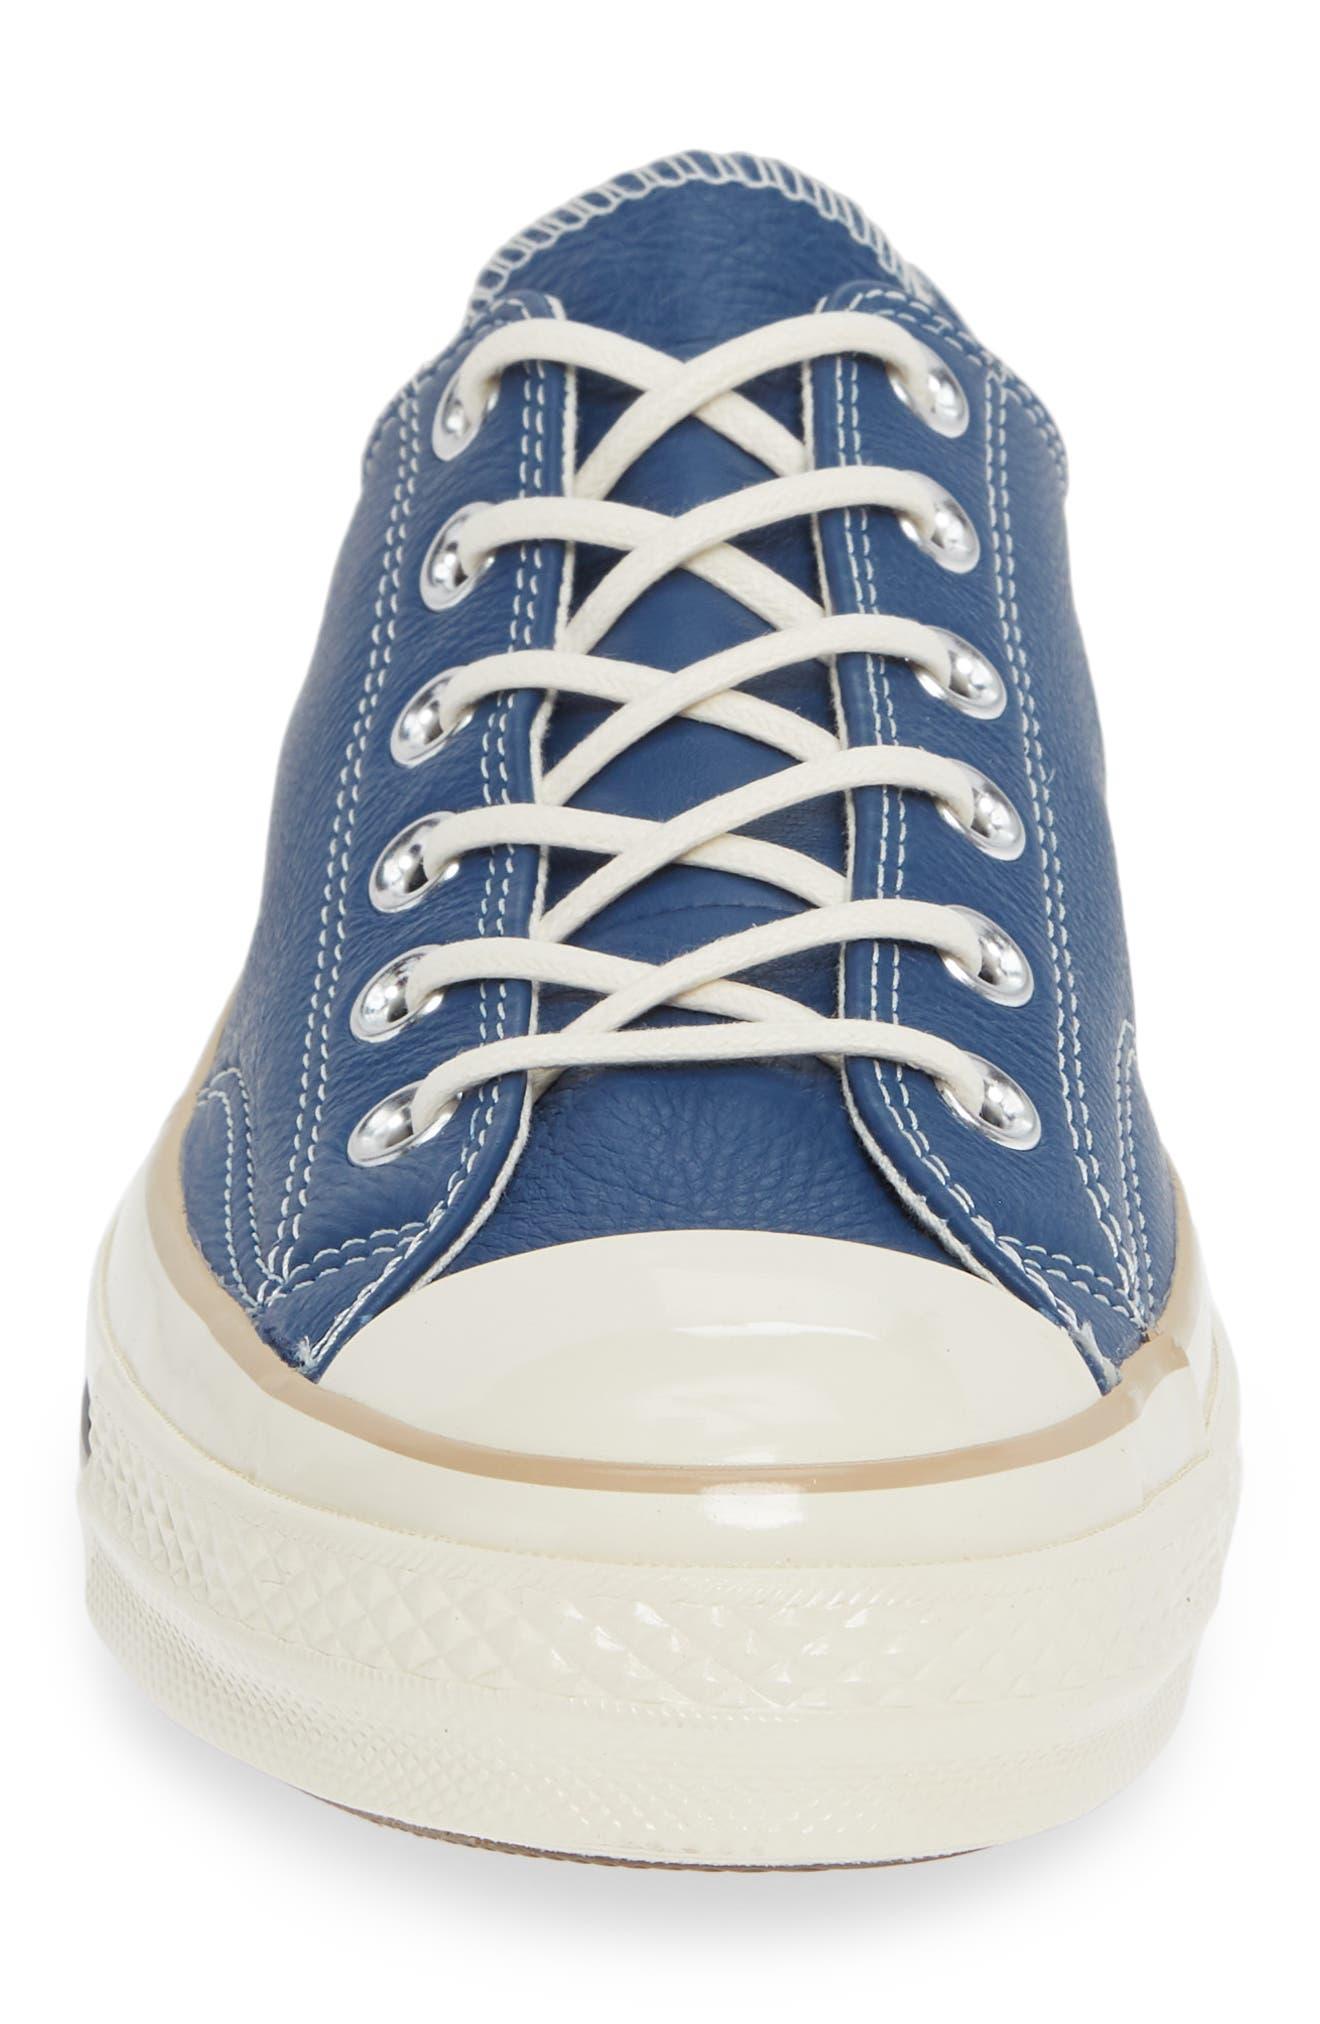 Chuck 70 Boot Leather Low Top Sneaker,                             Alternate thumbnail 4, color,                             DARK BURGUNDY/ CYAN/ EGRET